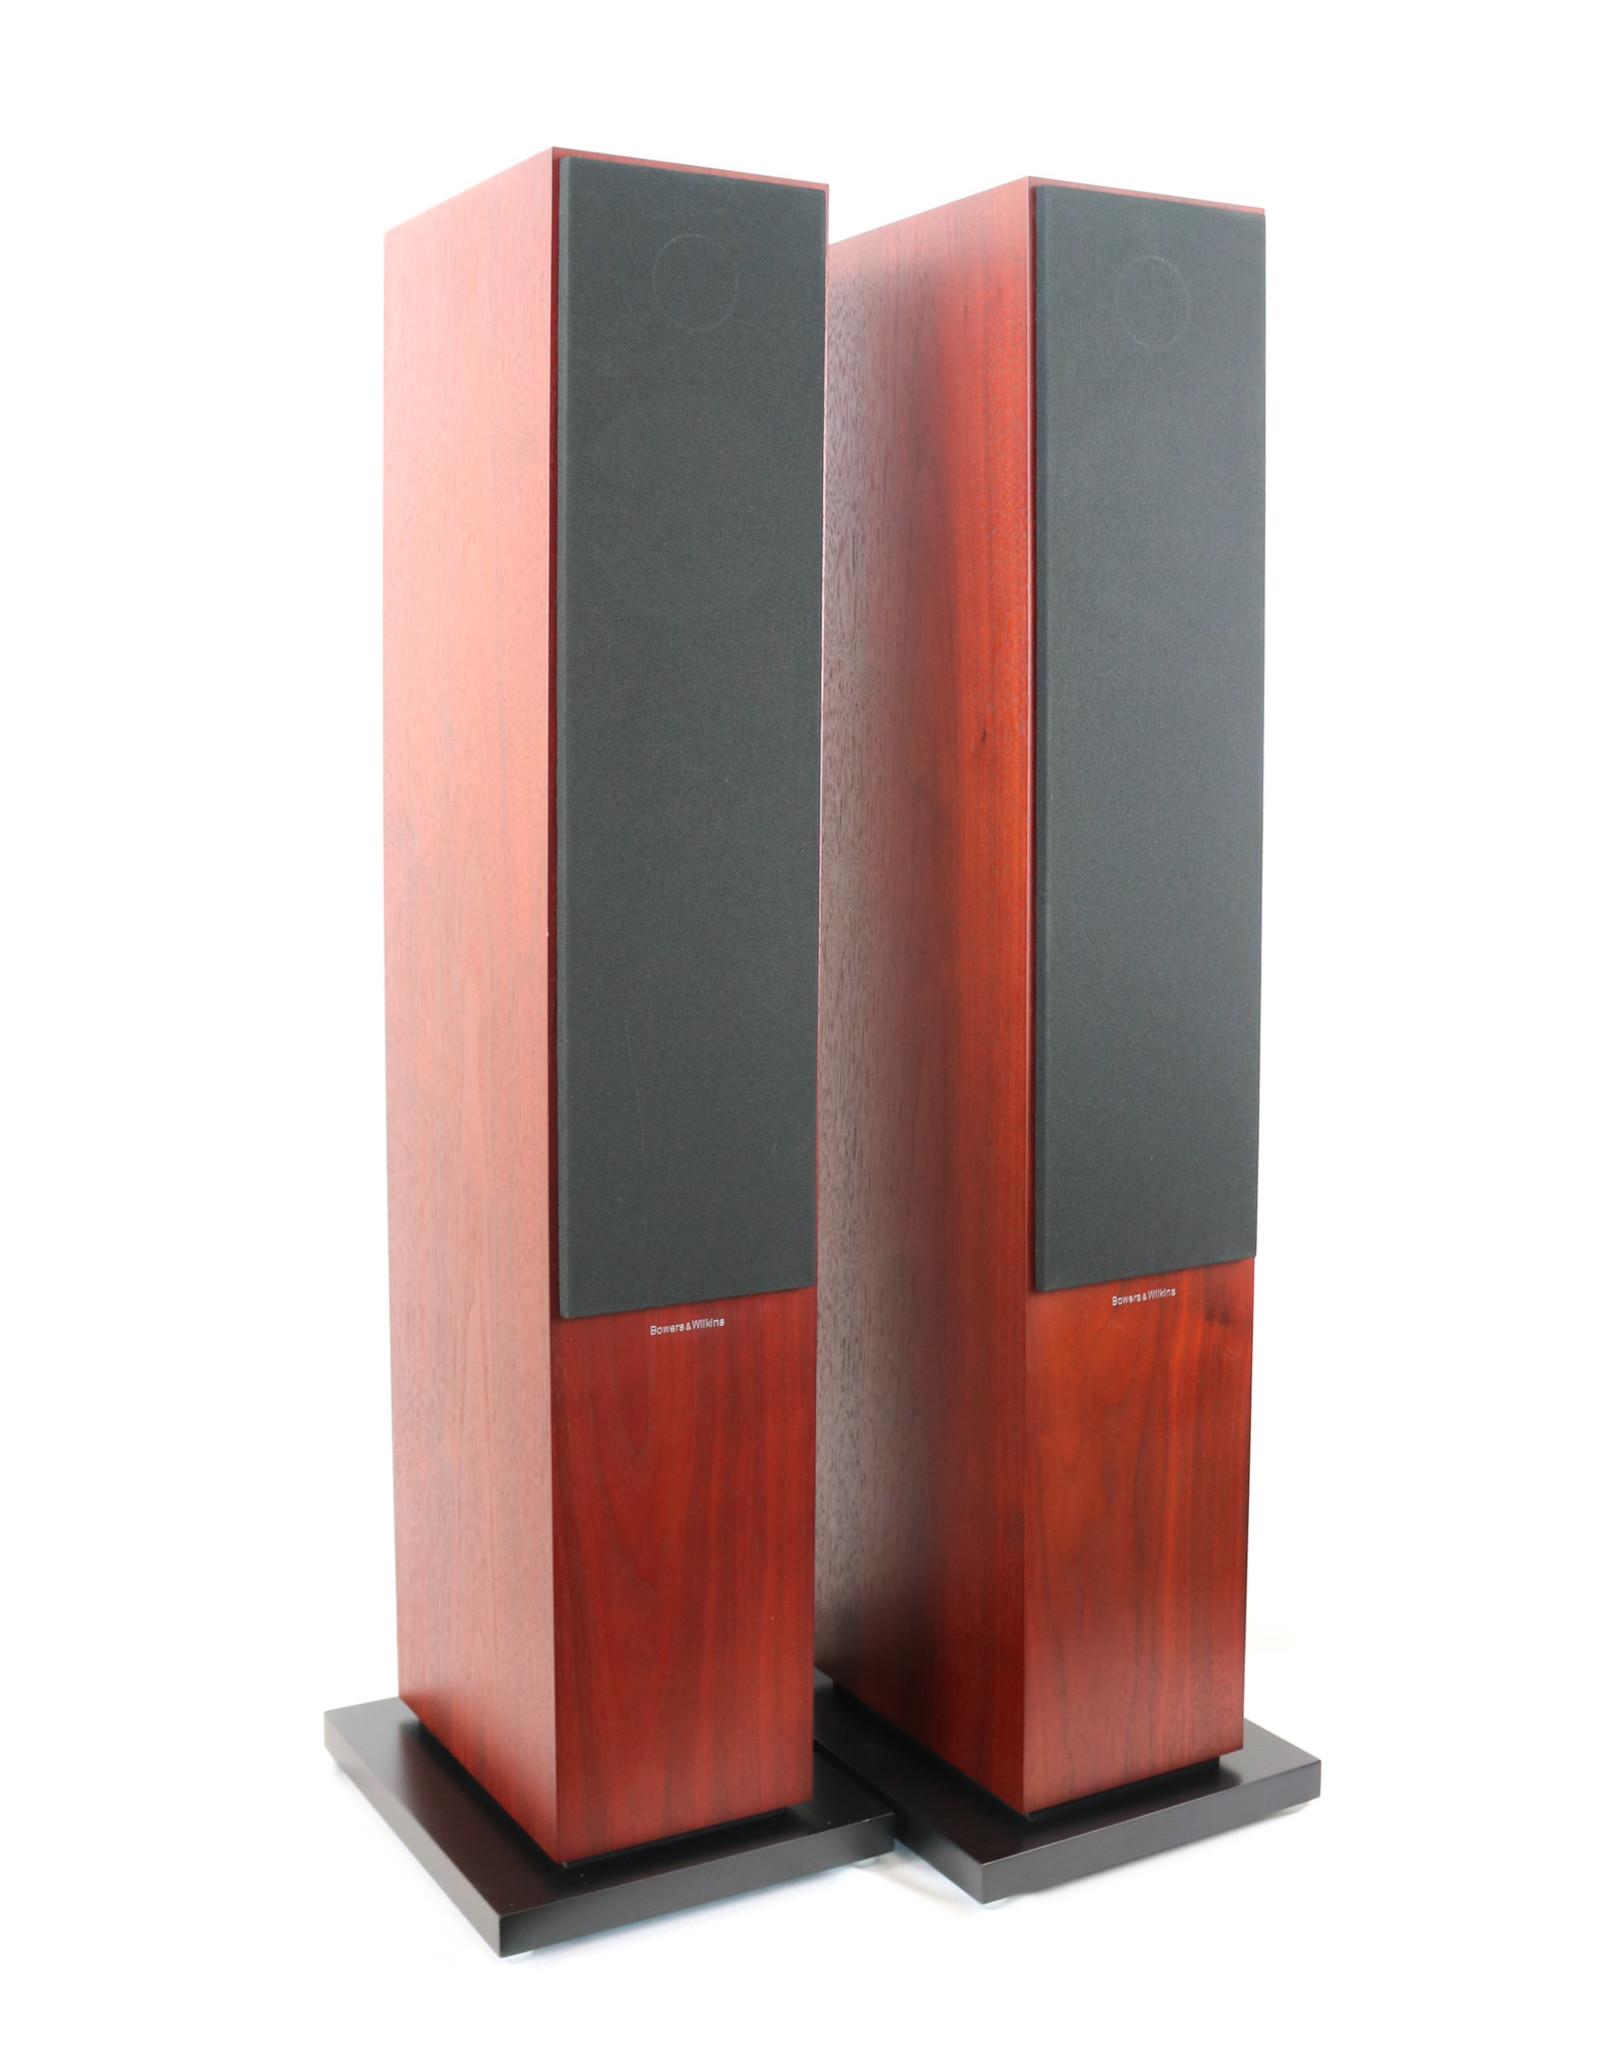 B&W B&W 704 S2 Floorstanding Speakers Rosenut USED